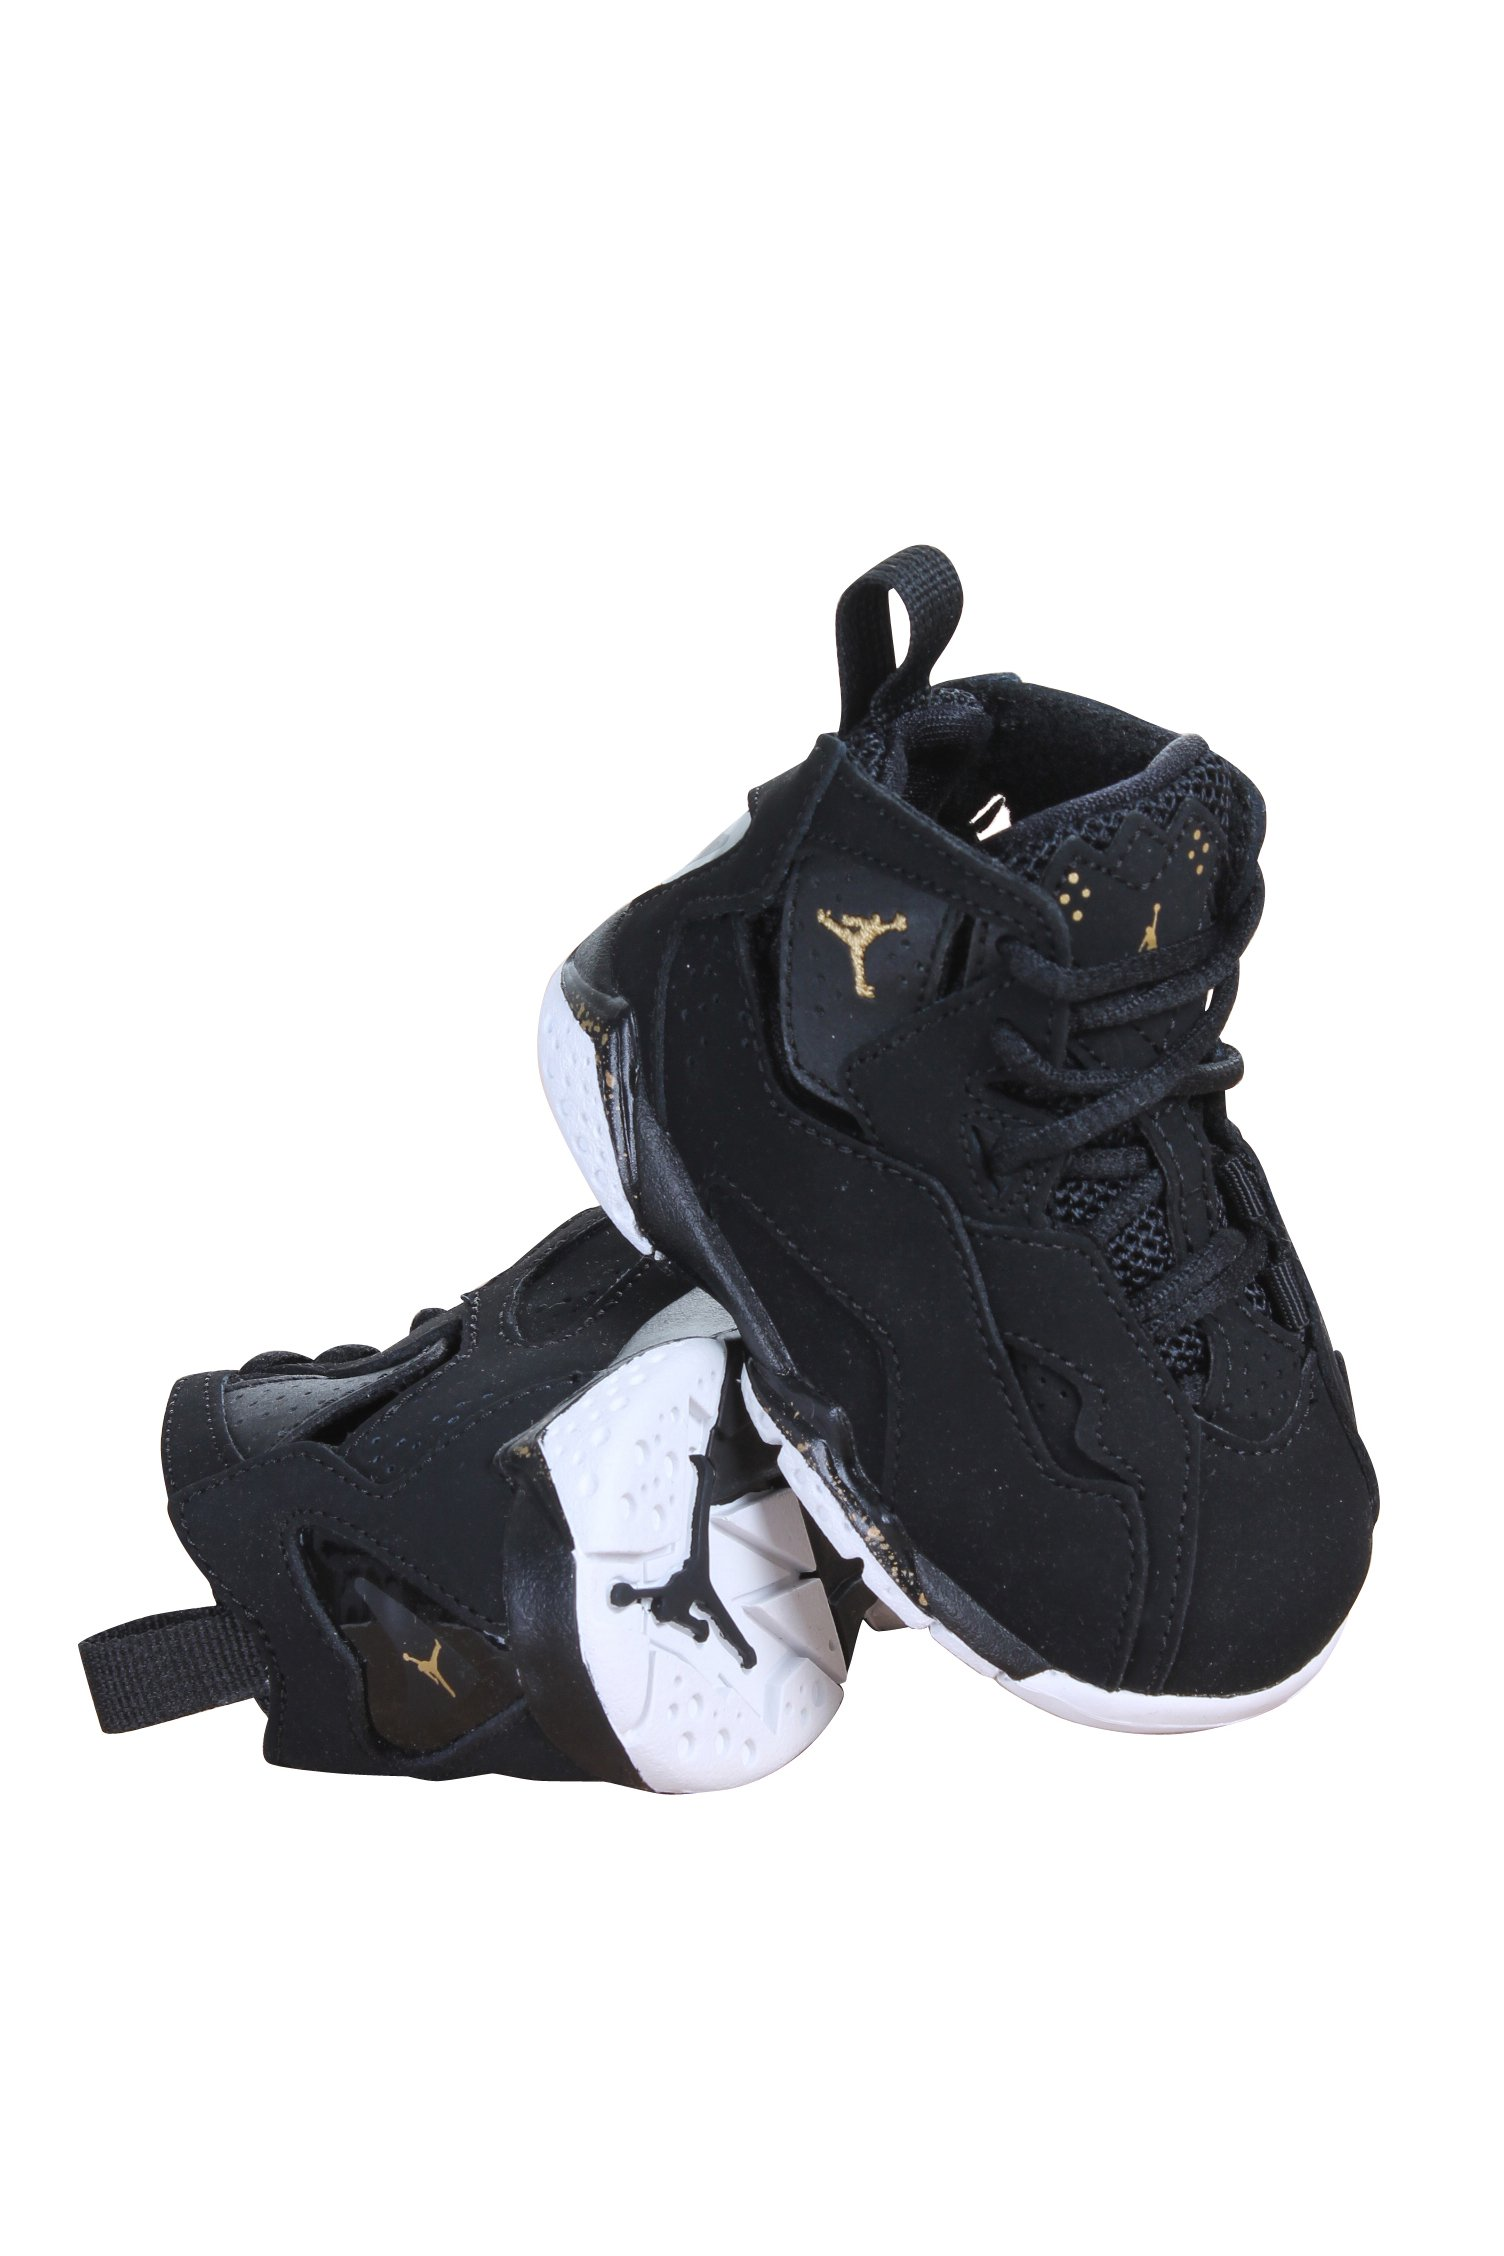 the latest d639a ce514 Galleon - Jordan True Flight Black Metallic Gold Black (TD) (7 M US Toddler)